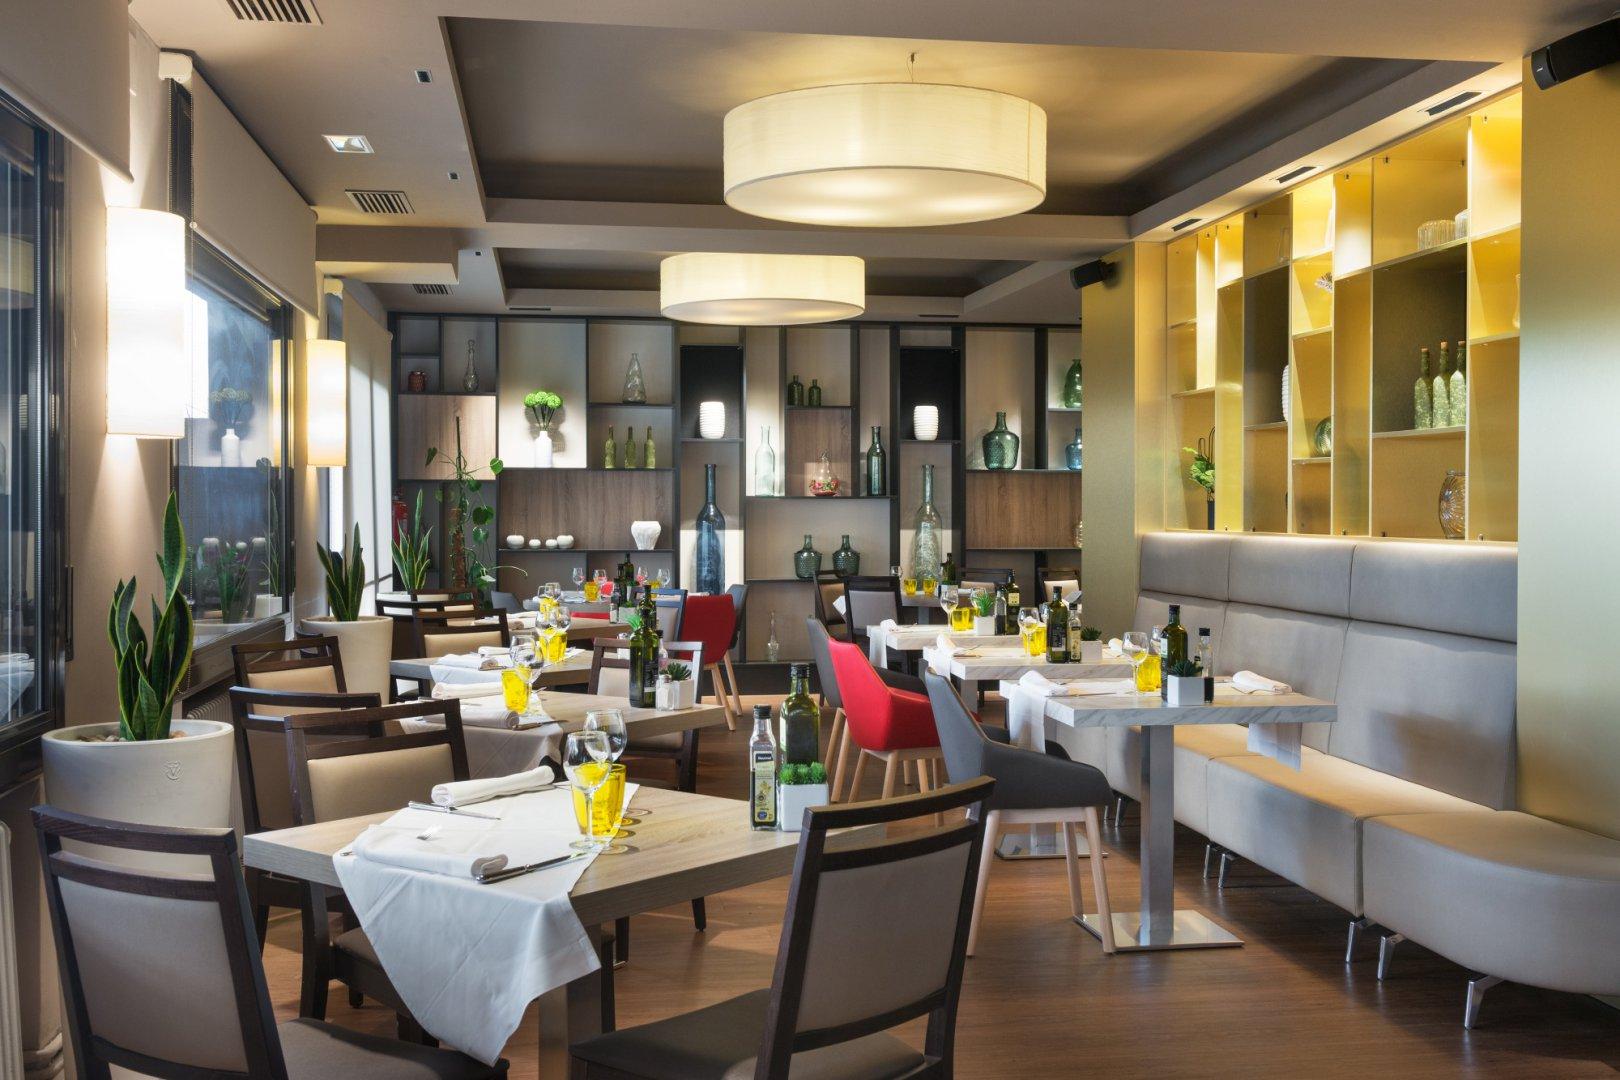 https://www.restaurantronda.com/imagecache/uploads_images_paginas_home_1620x1080_c_dsc-7929-copia.jpg